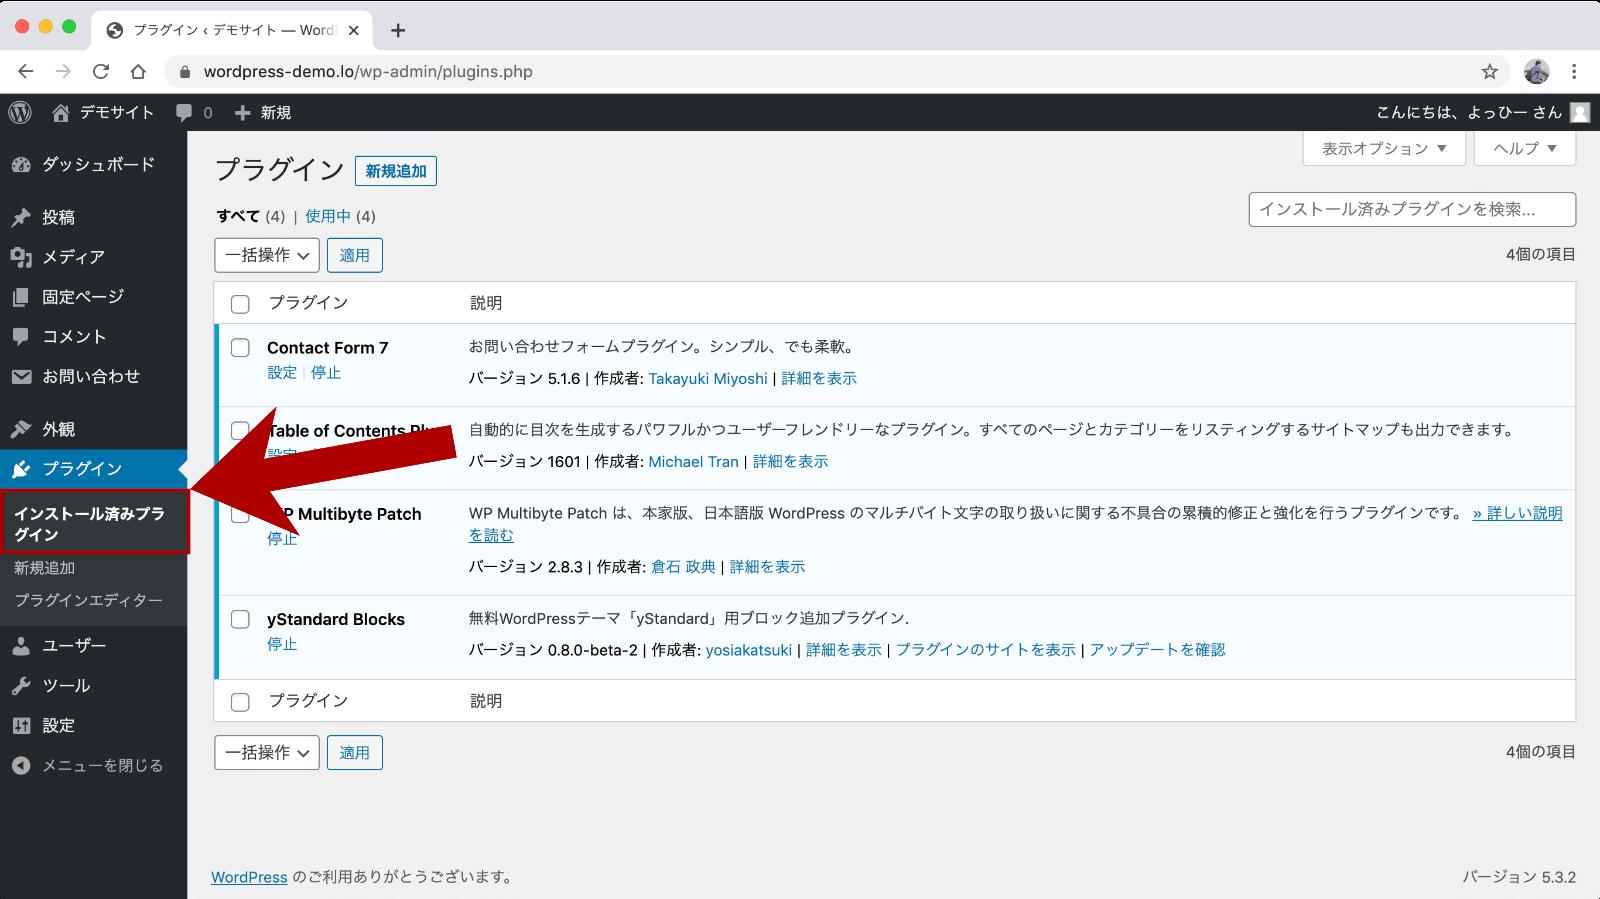 WordPressでインストール済みのプラグイン一覧を表示する